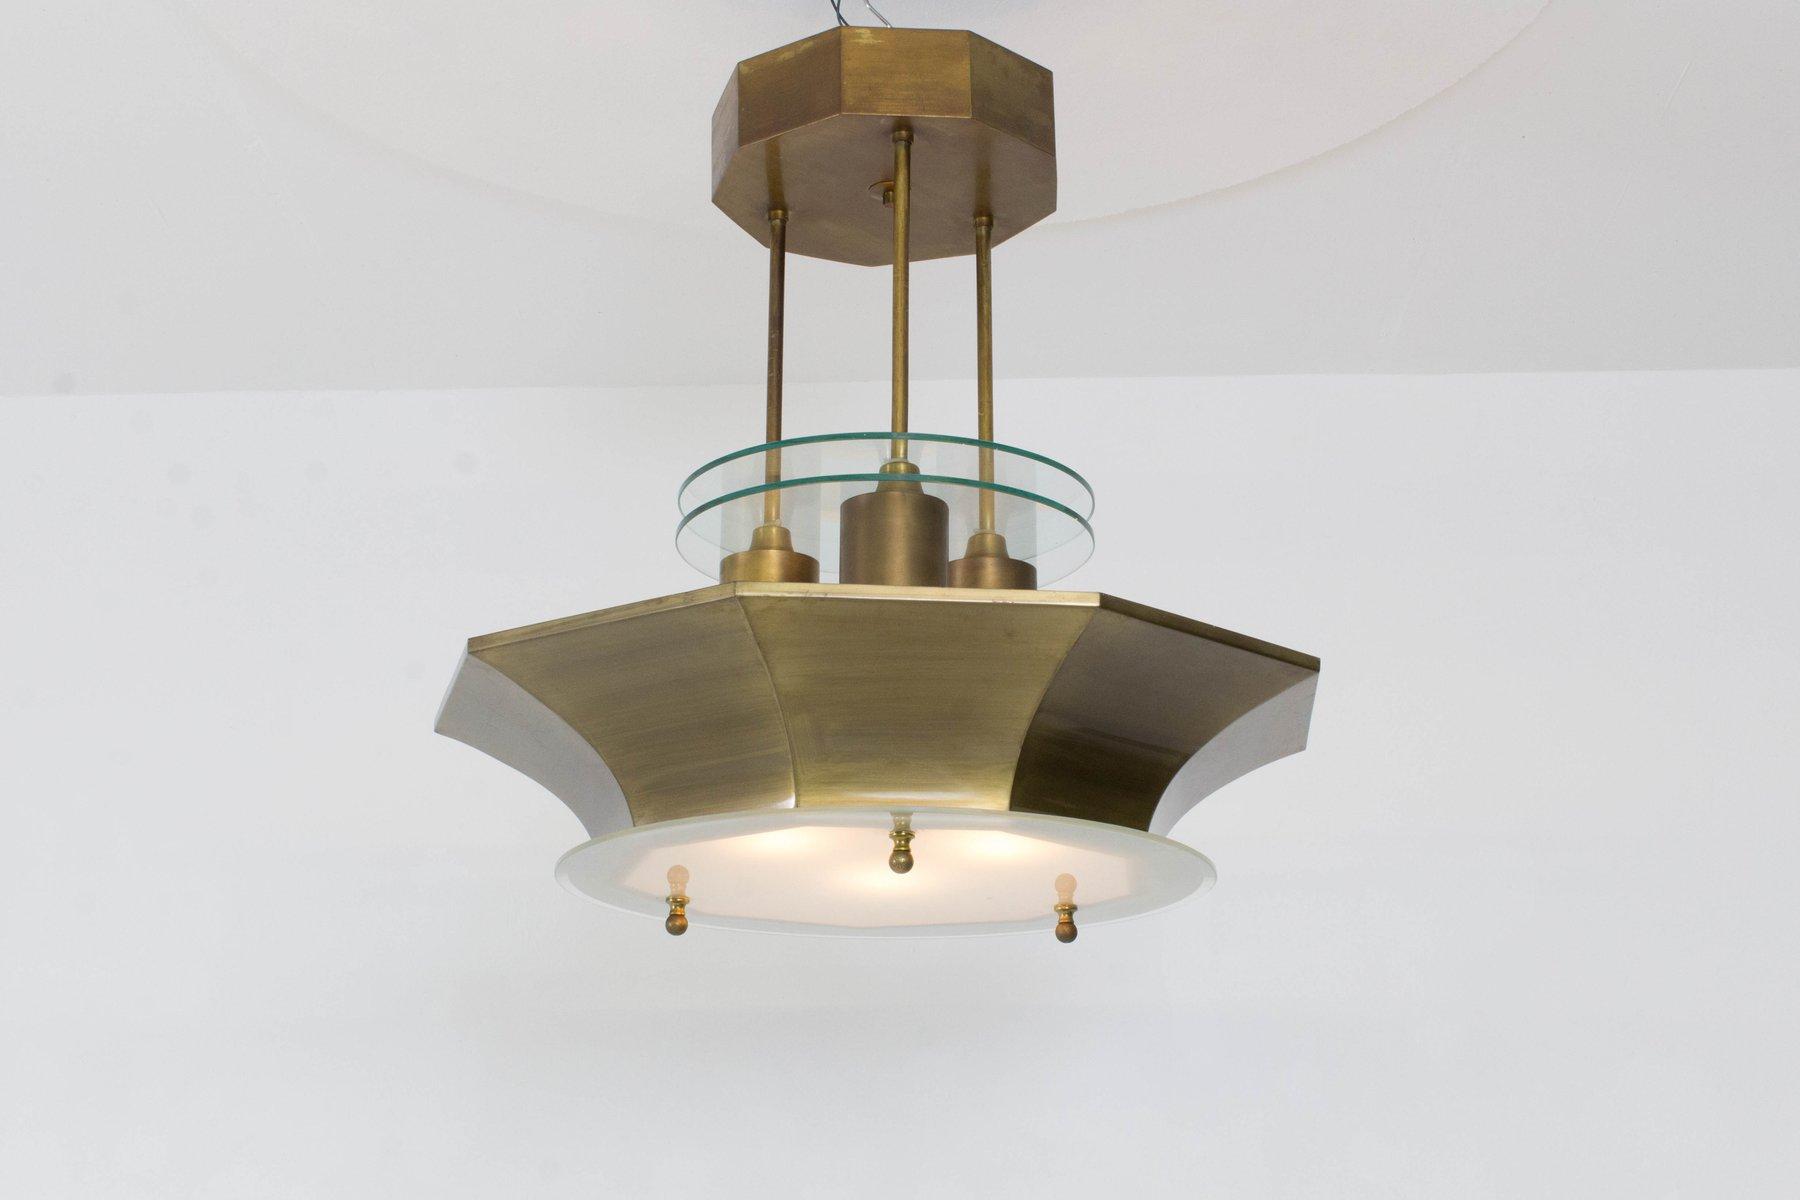 art deco haager schule lampe aus messing und ge tztem glas 1930er bei pamono kaufen. Black Bedroom Furniture Sets. Home Design Ideas